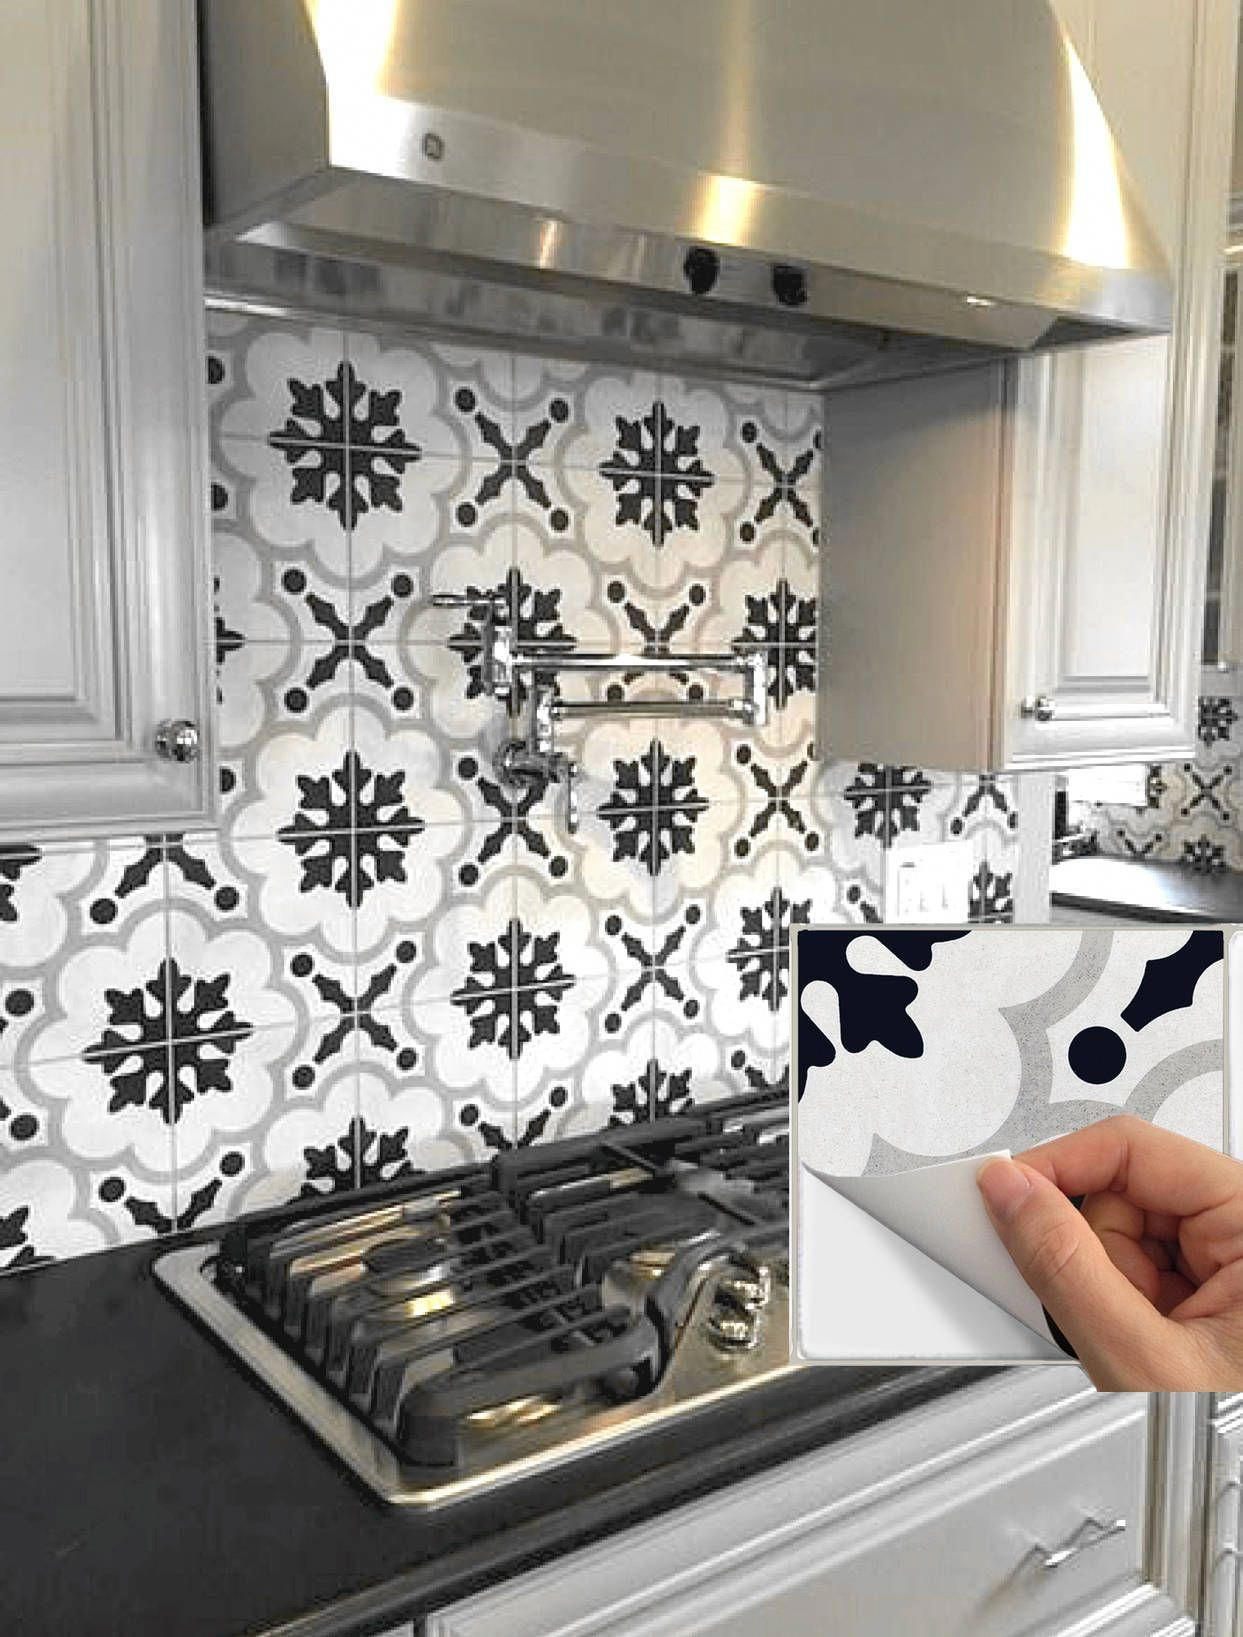 Kitchenbacksplash In 2020 Kitchen Remodel Small Diy Kitchen Remodel Wall Waterproofing